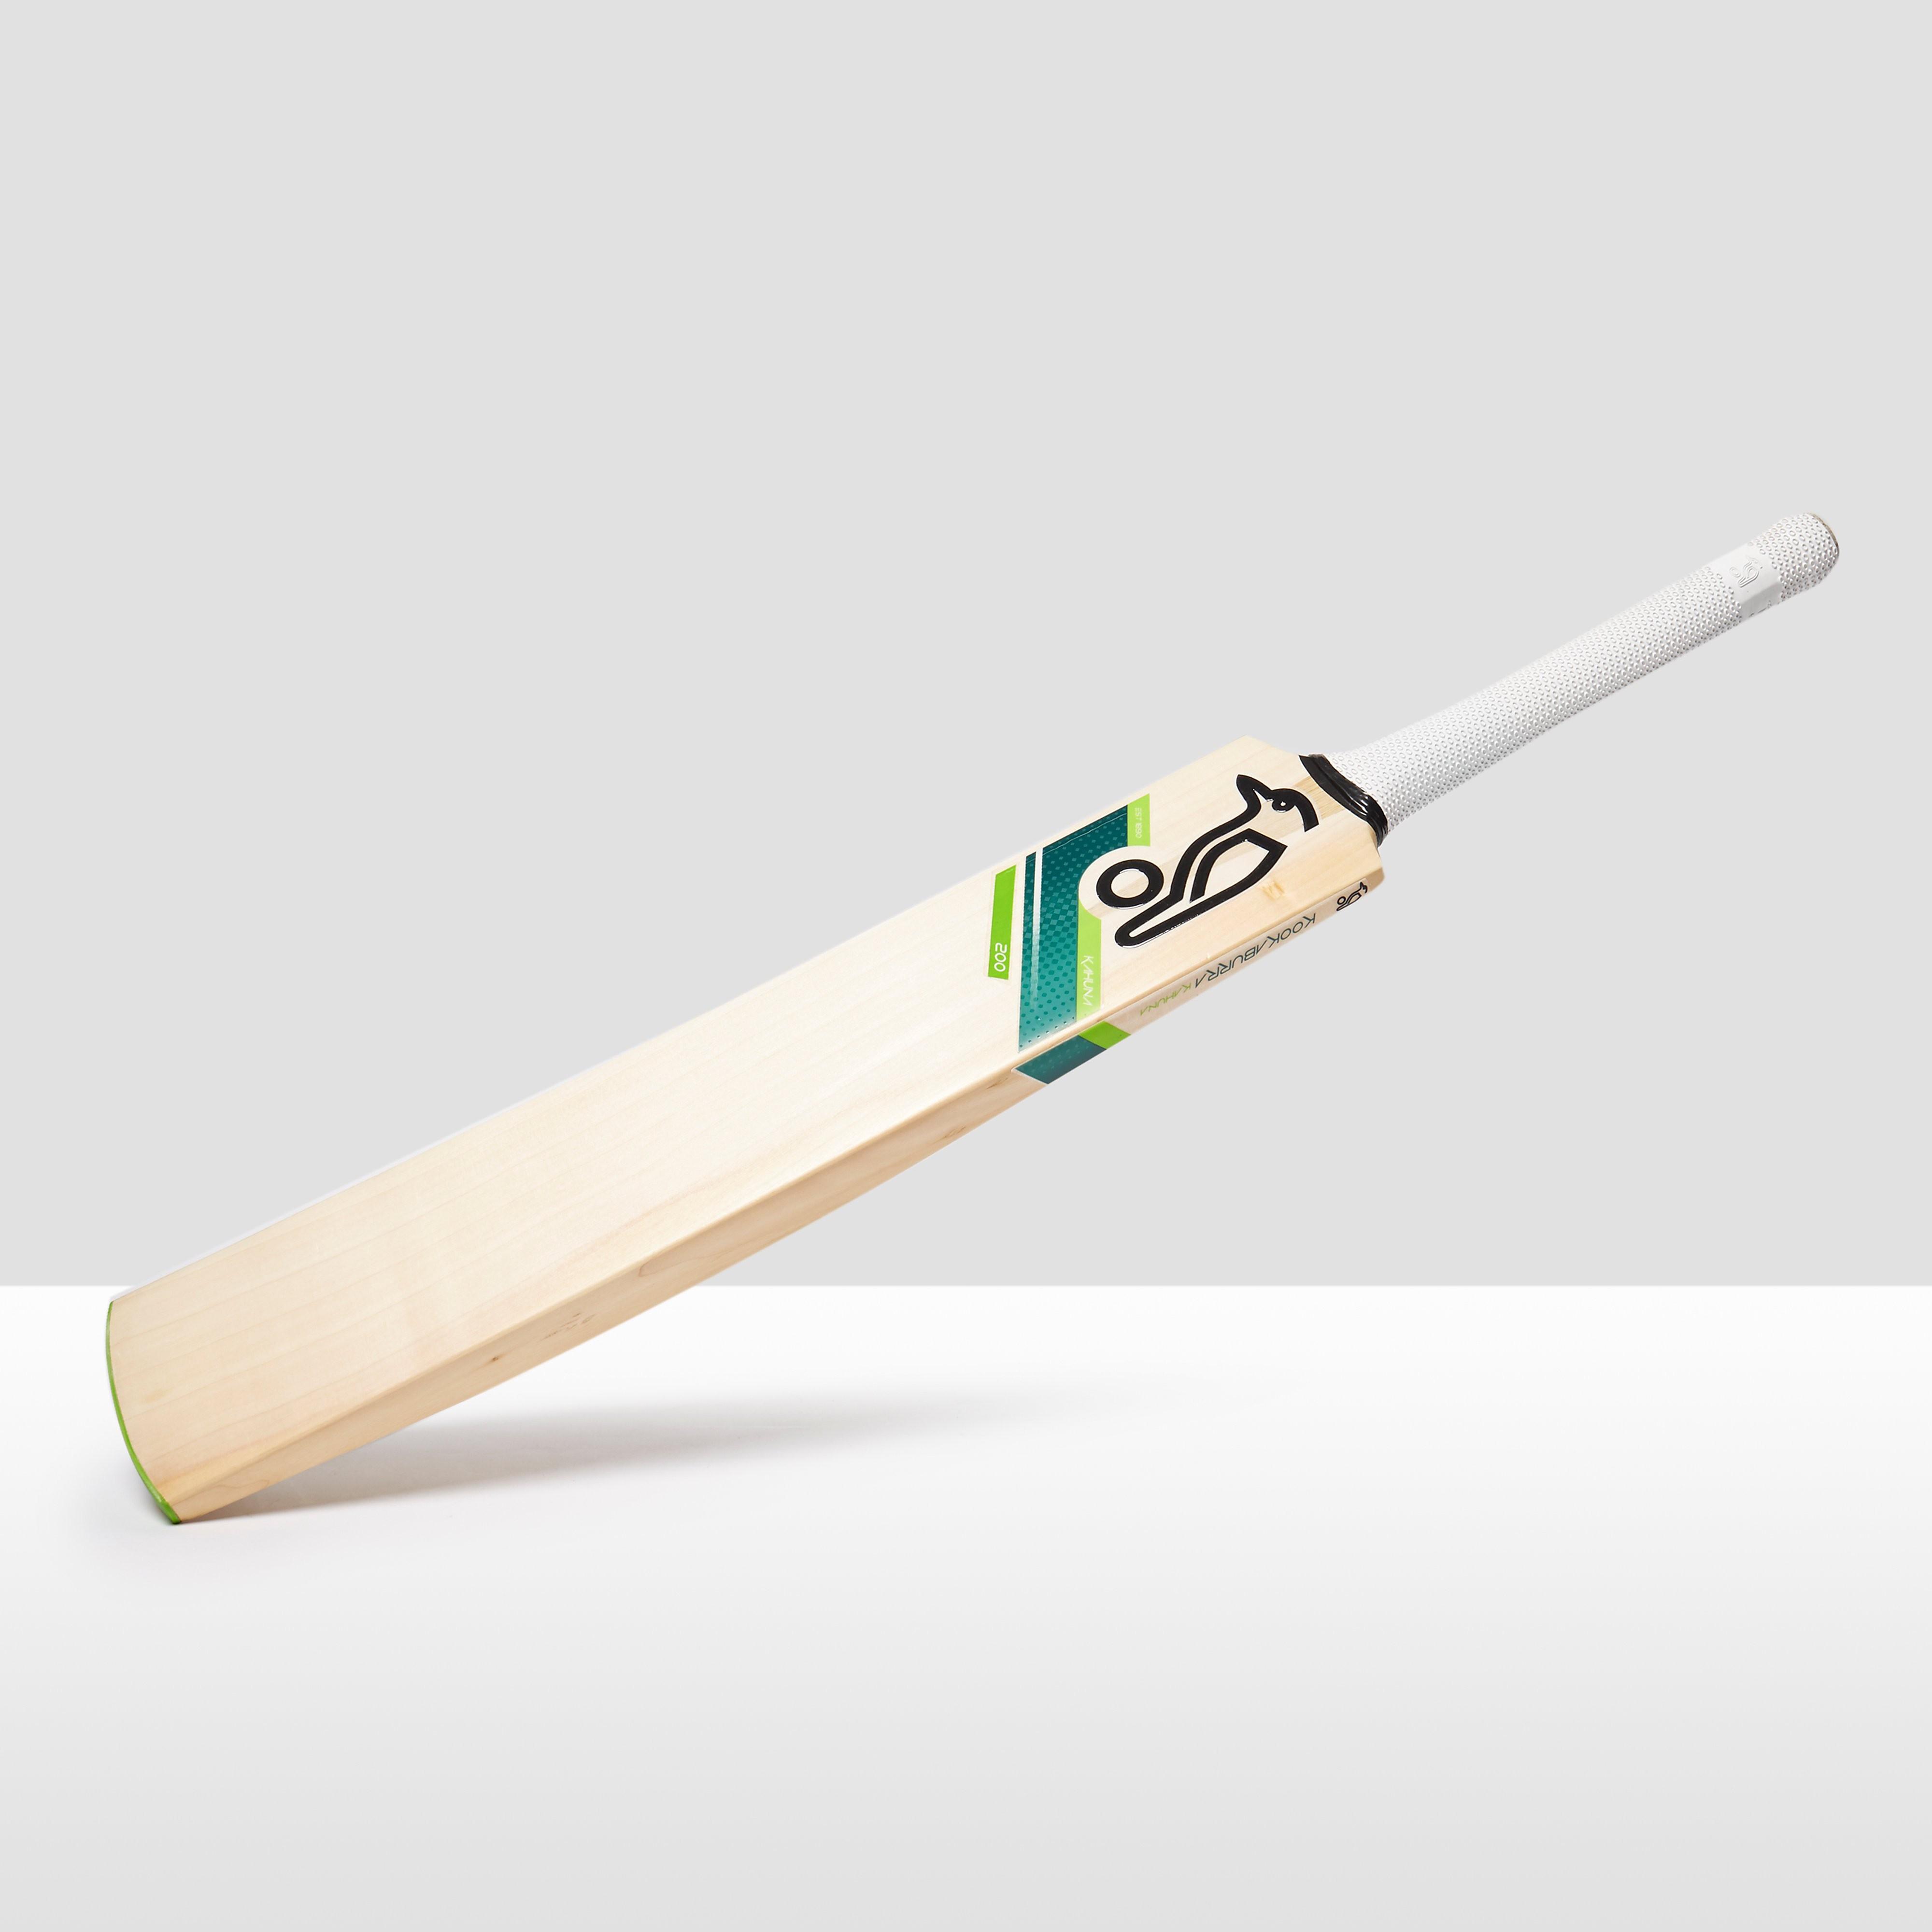 Kookaburra Kahuna 200 Junior Cricket Bat